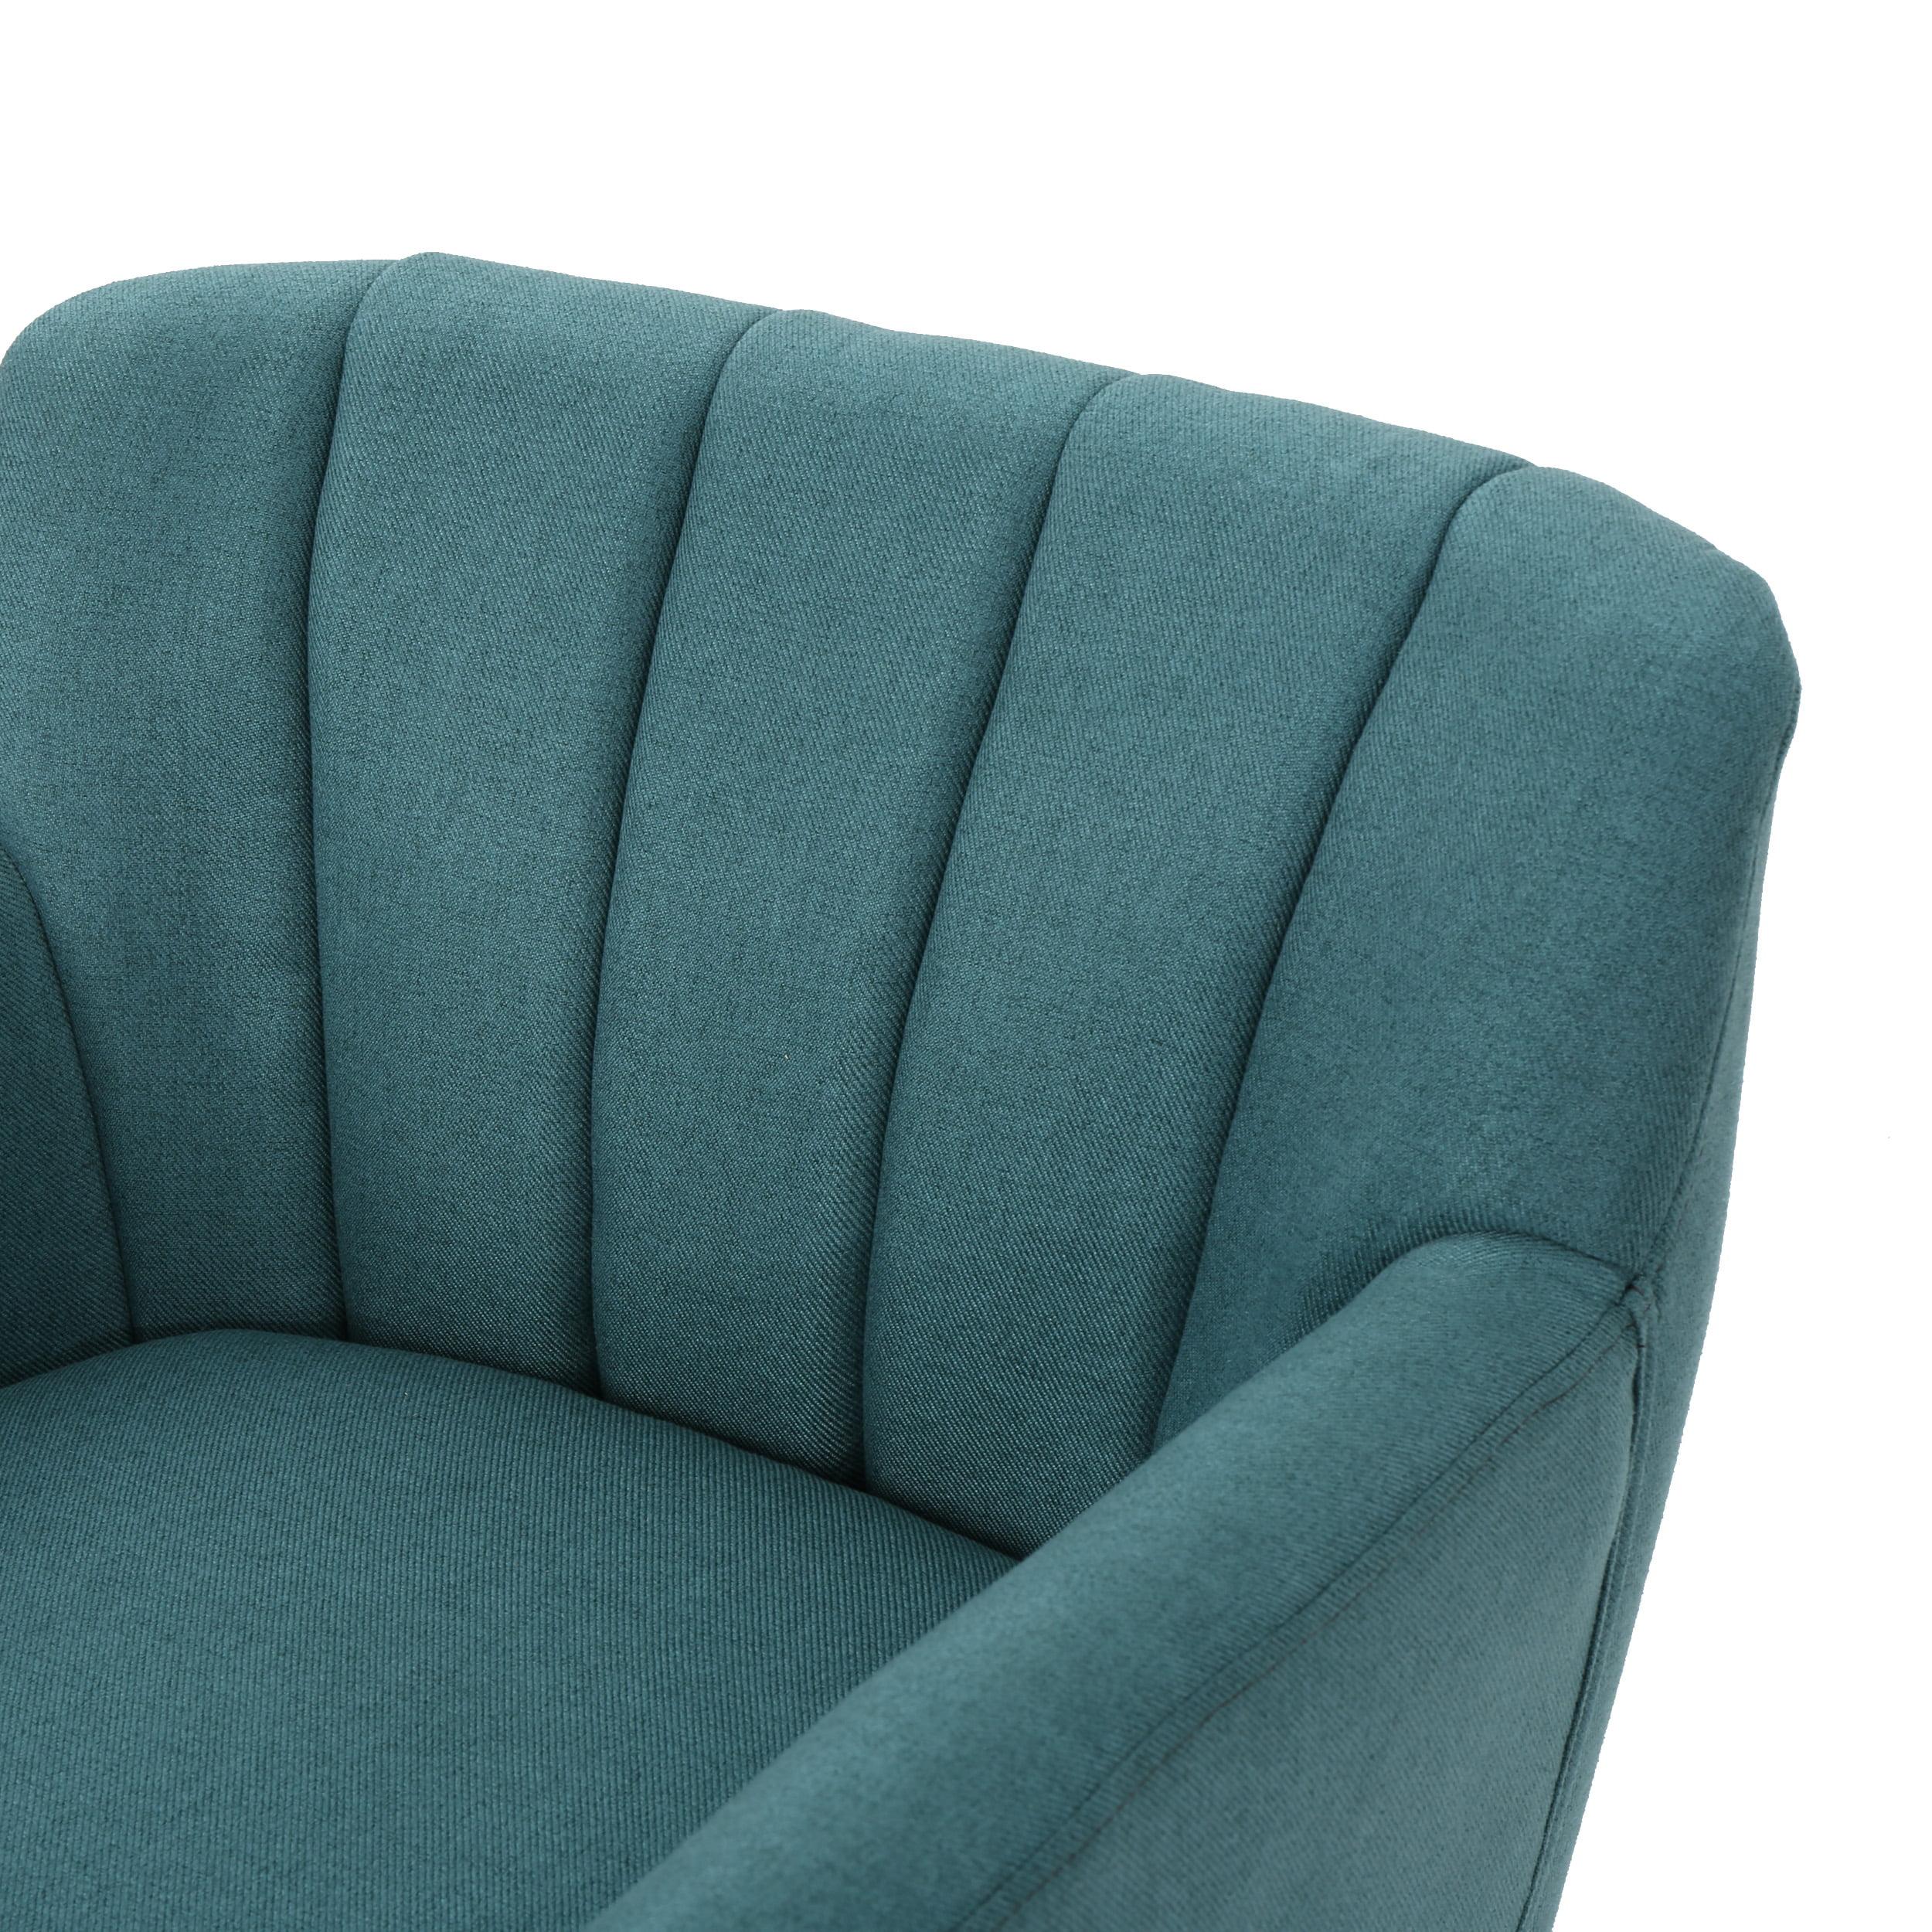 Terrific Madelyn Mid Century Modern Fabric Club Chair Dark Teal Machost Co Dining Chair Design Ideas Machostcouk